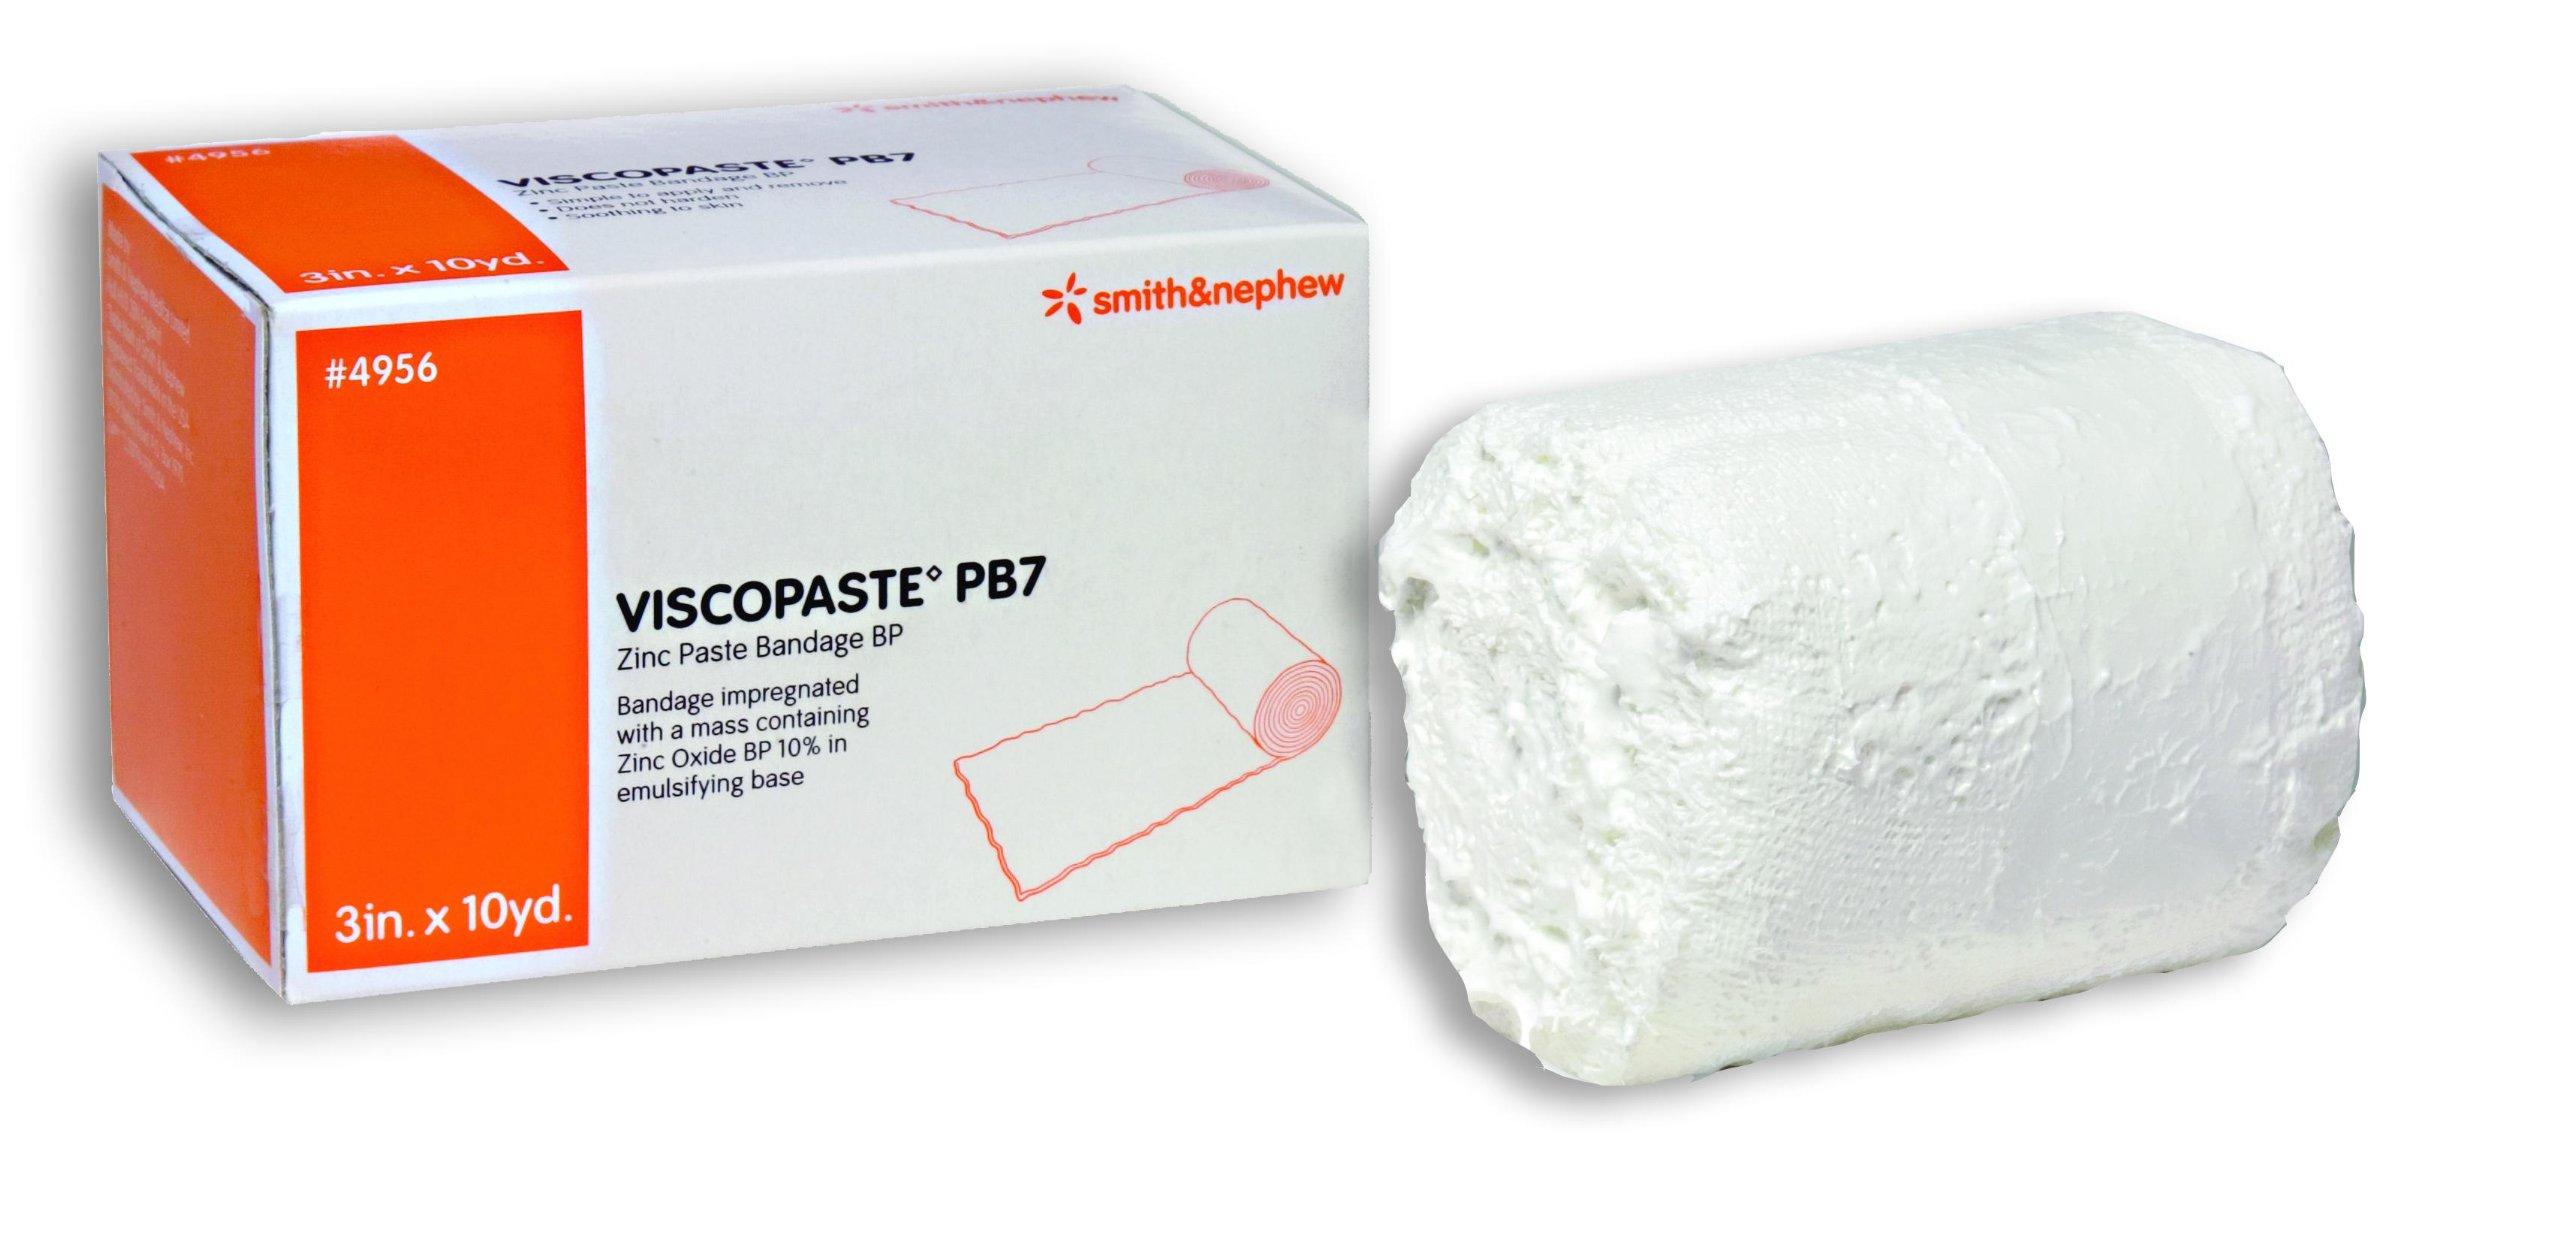 Viscopaste Pb7 Zinc Paste Bandage Case of 48